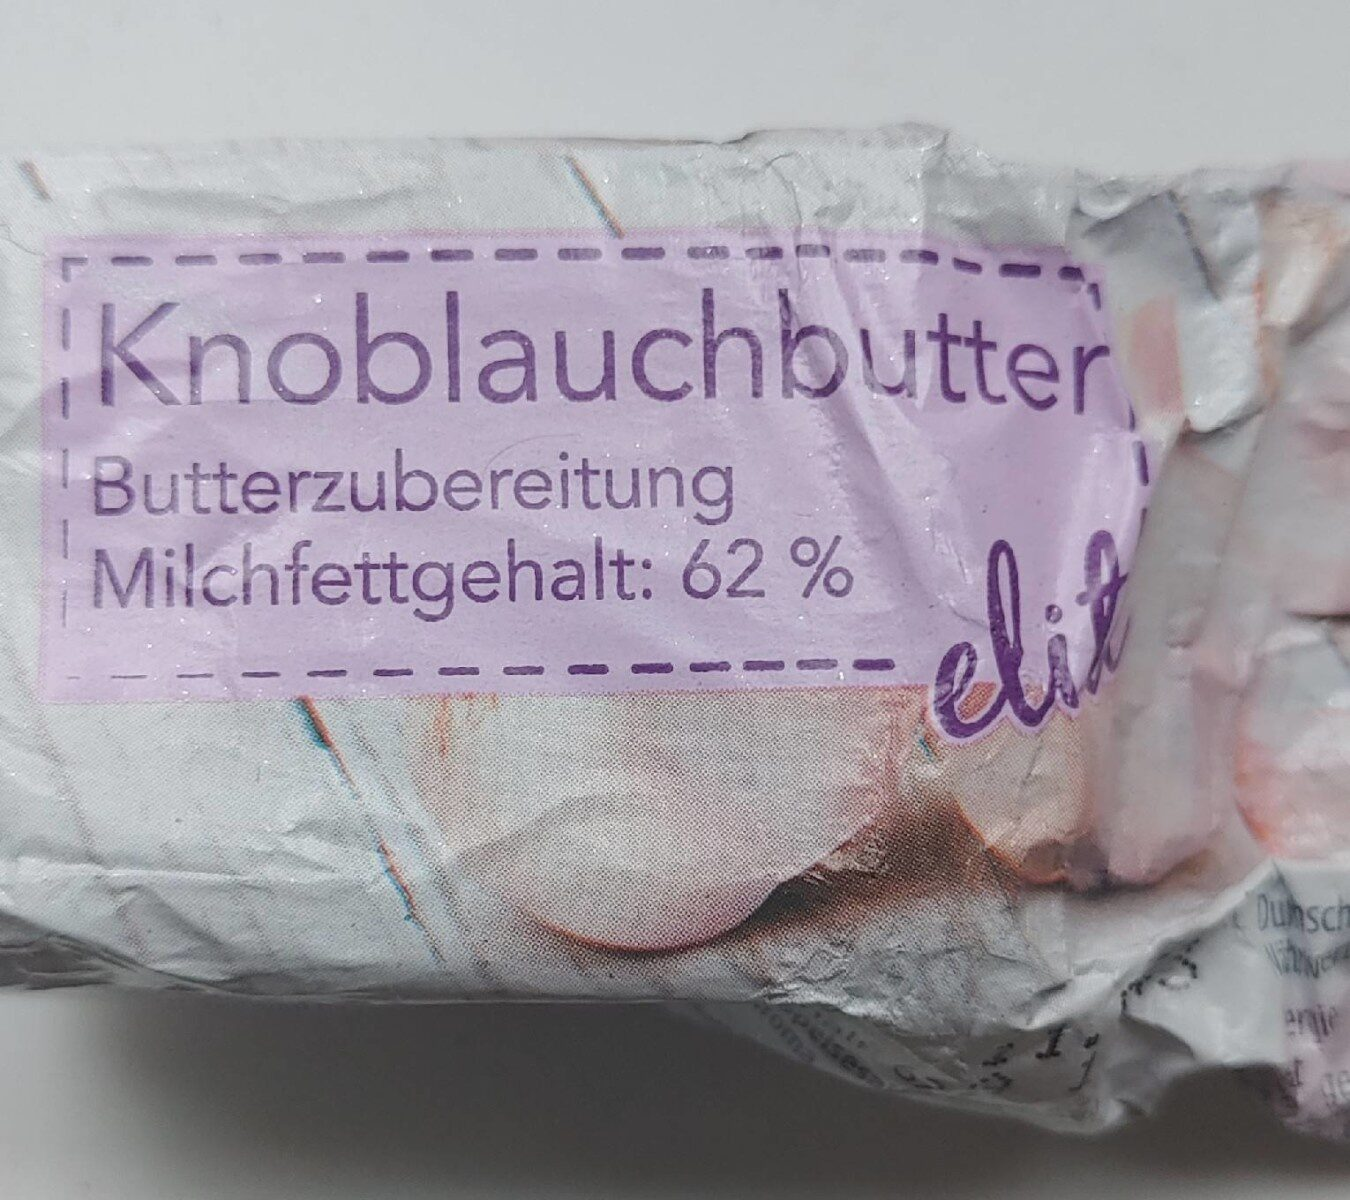 Knoblauchbutter elite - Produkt - de